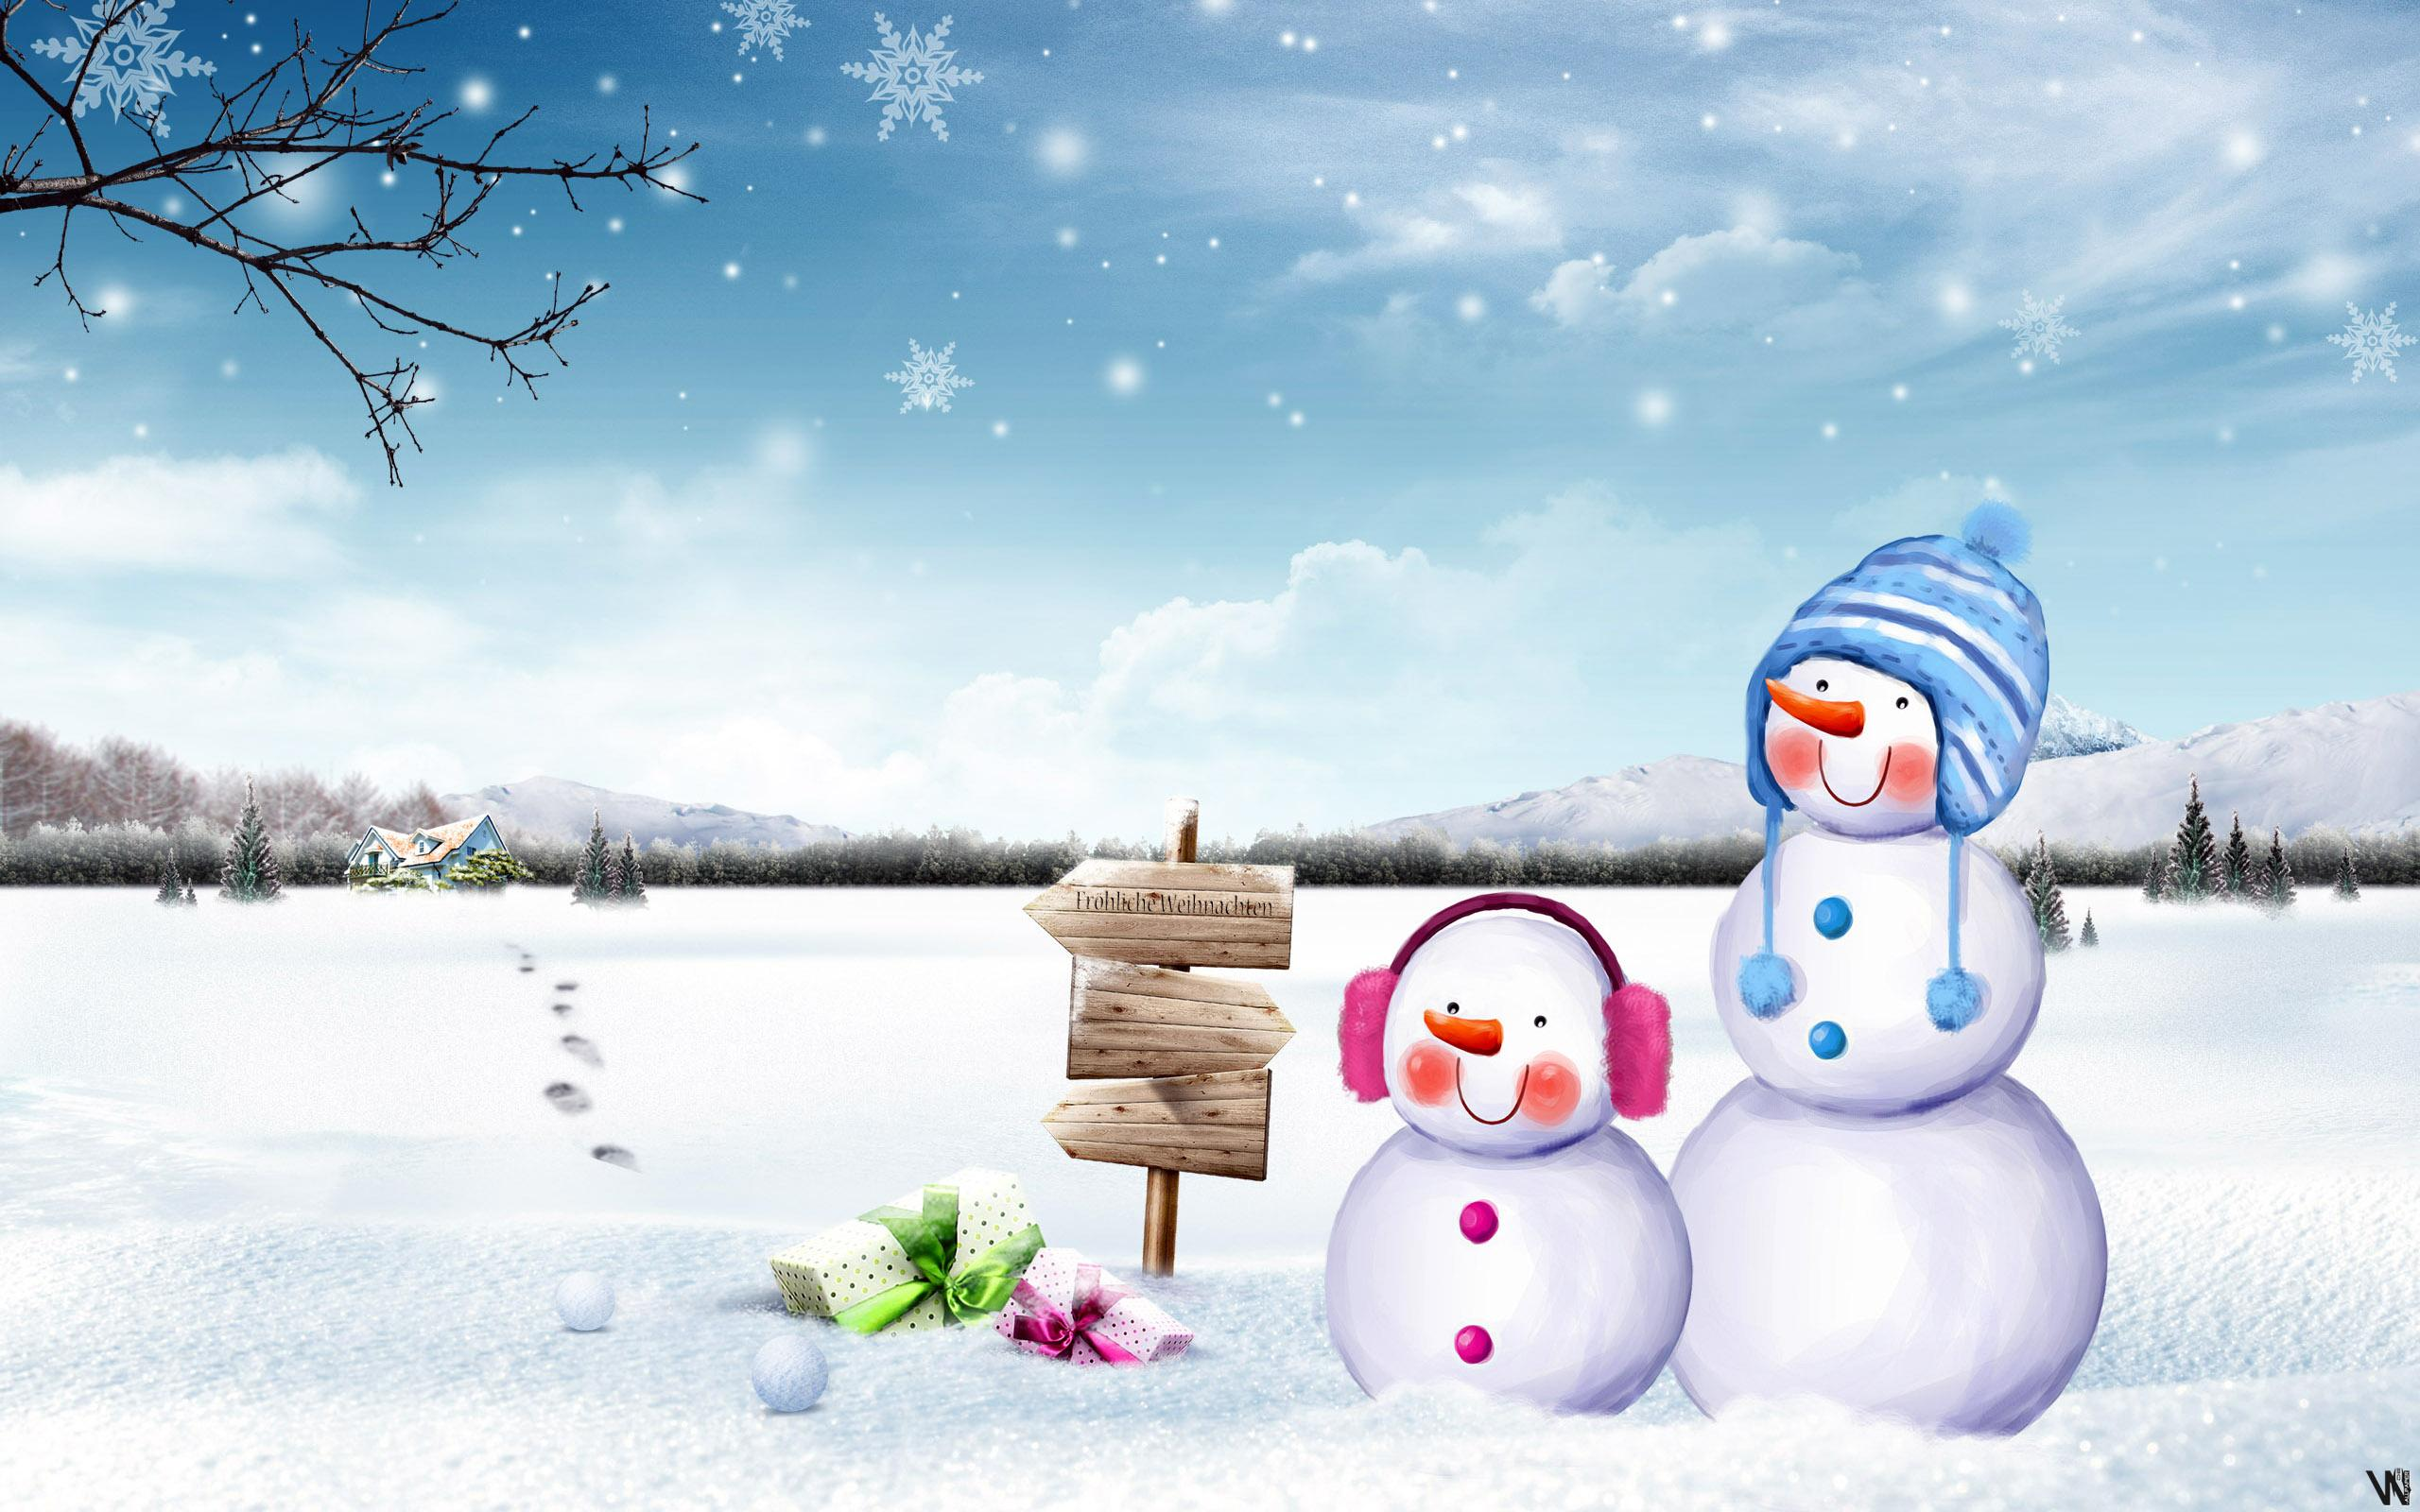 50 Real Snowman Wallpapers   Download at WallpaperBro 2560x1600